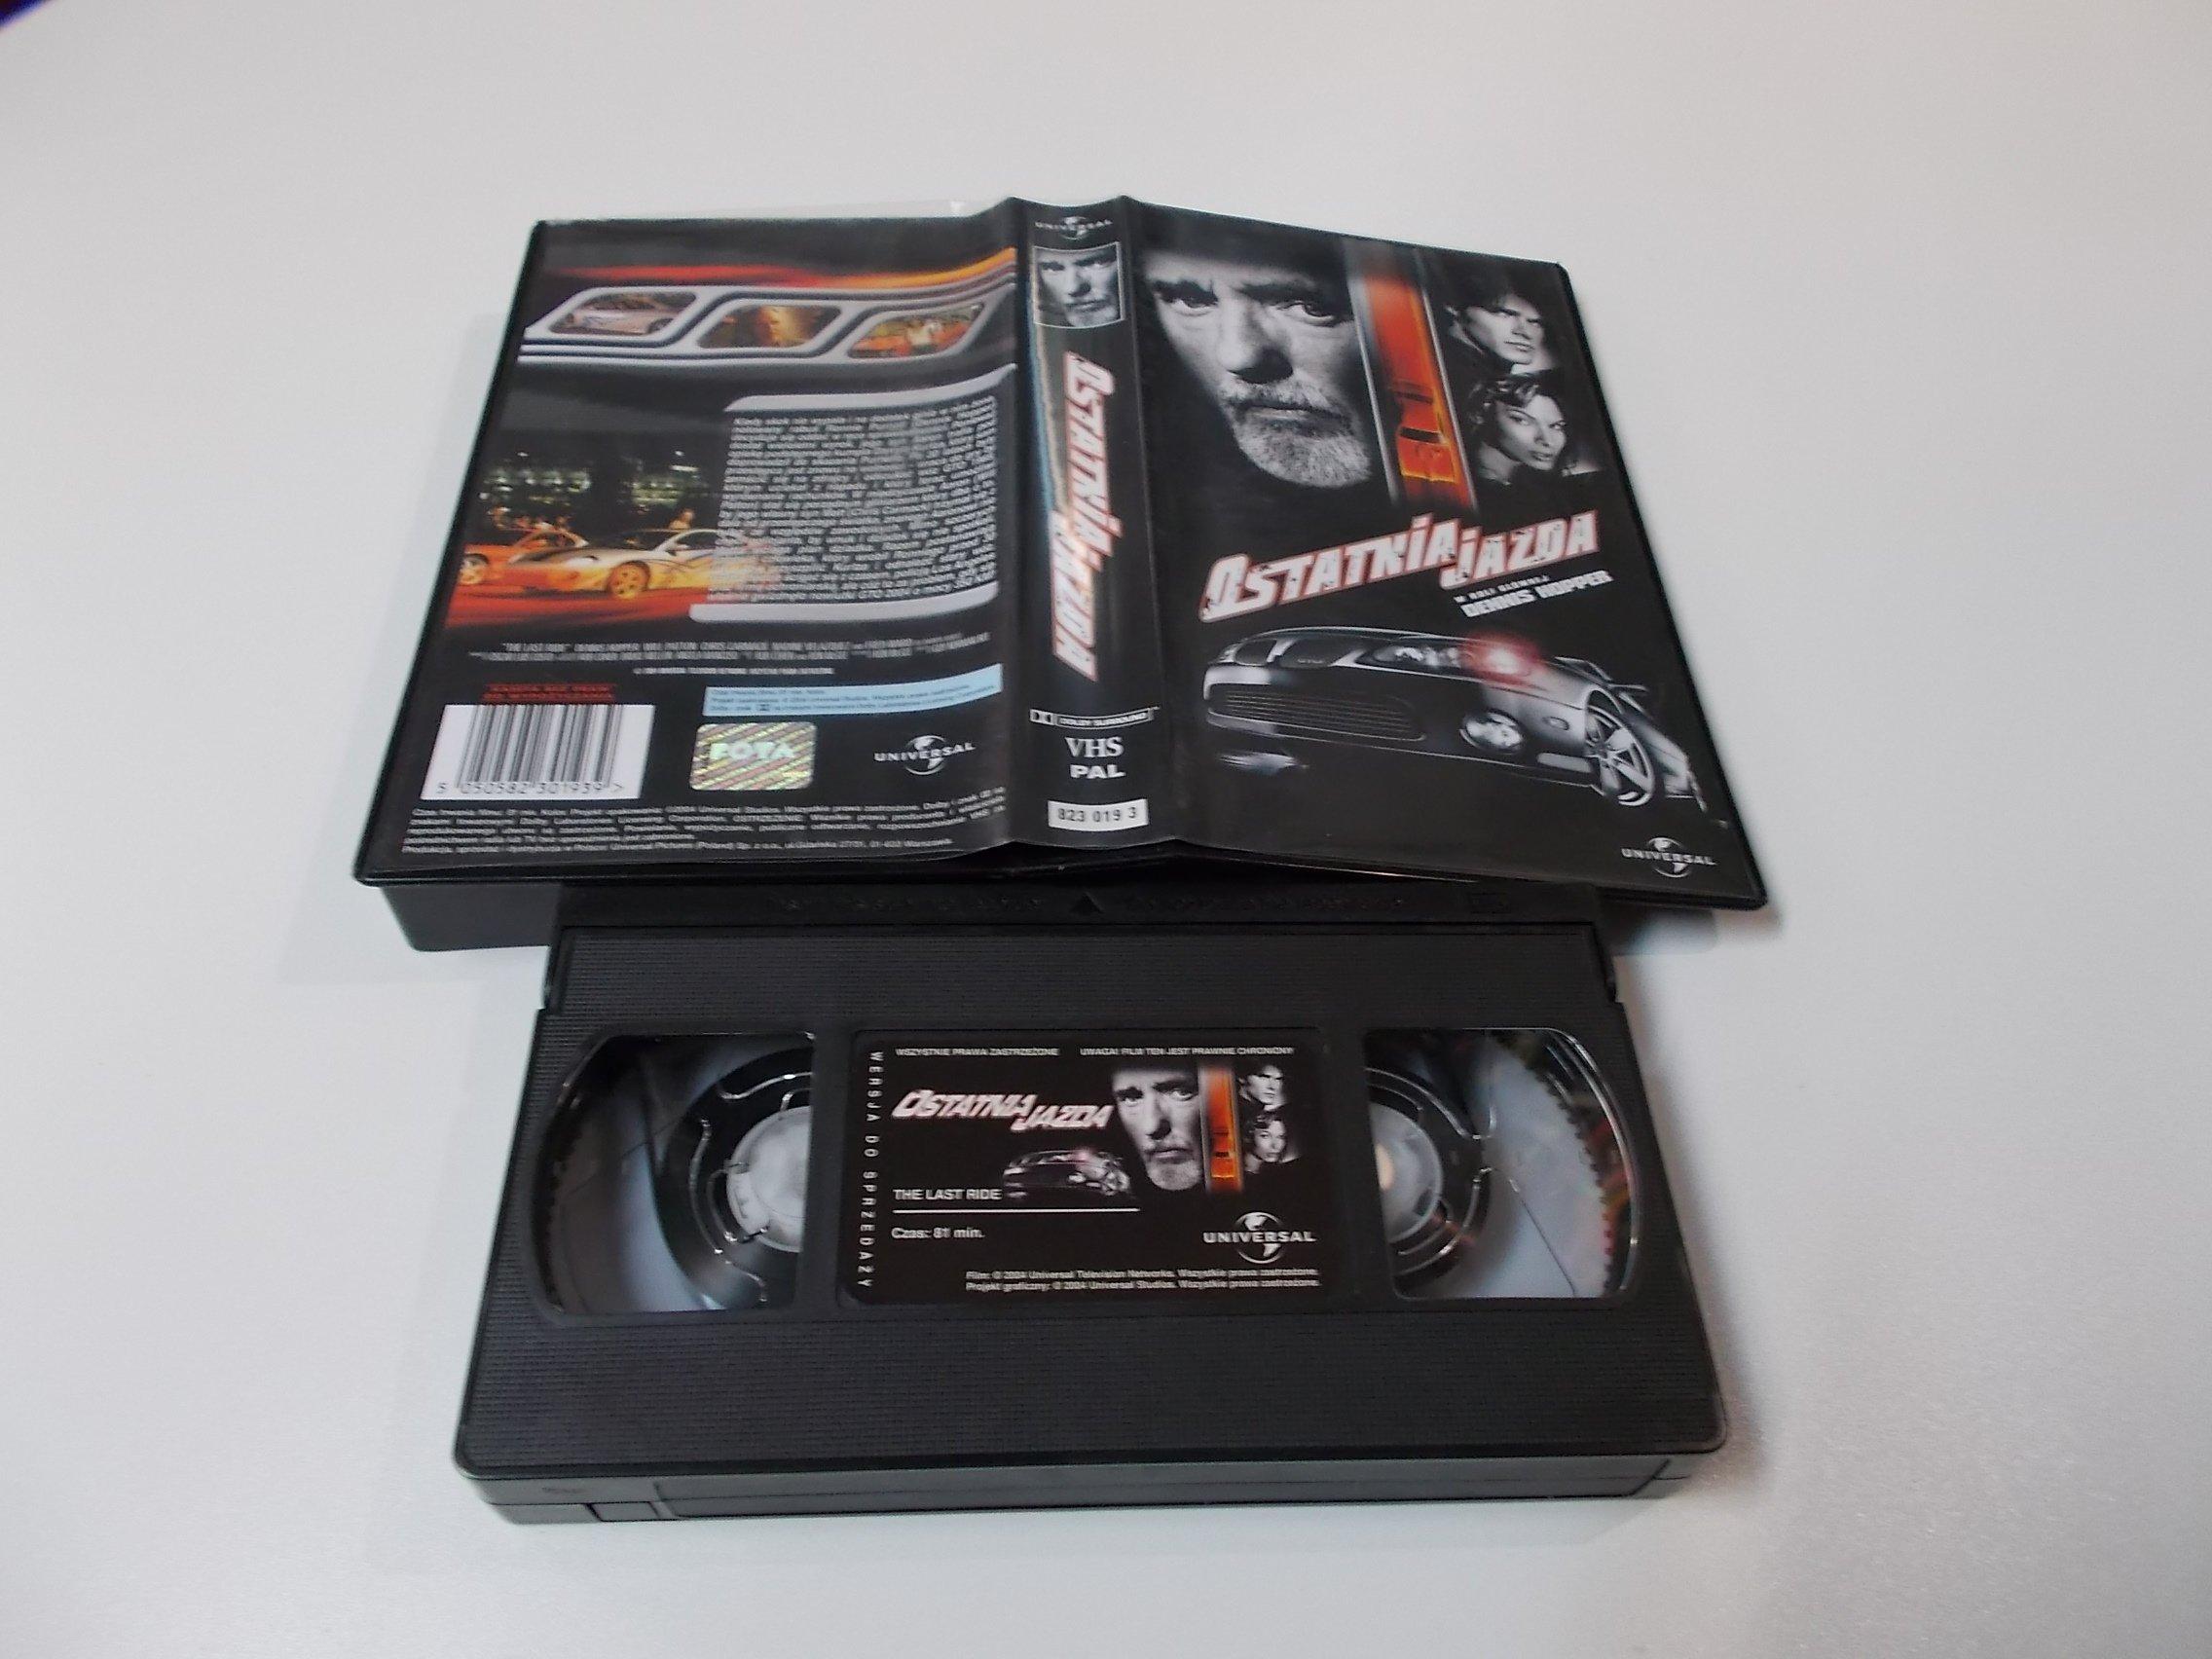 OSTATNIA JAZDA - VHS Kaseta Video - Opole 1636